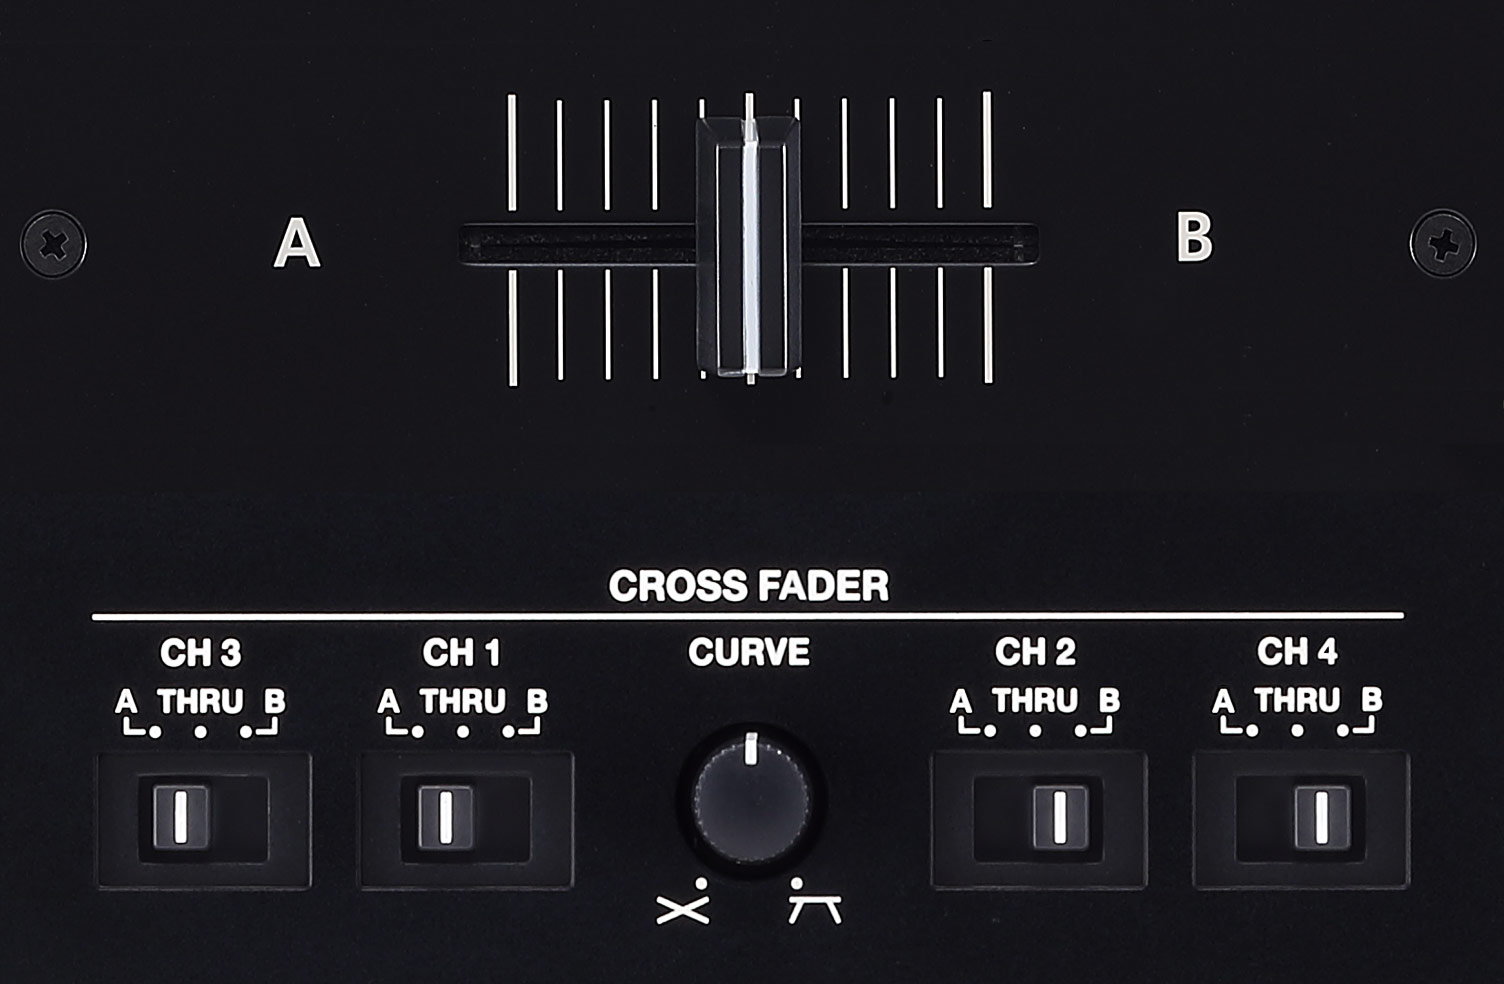 Fully Adjustable Crossfader